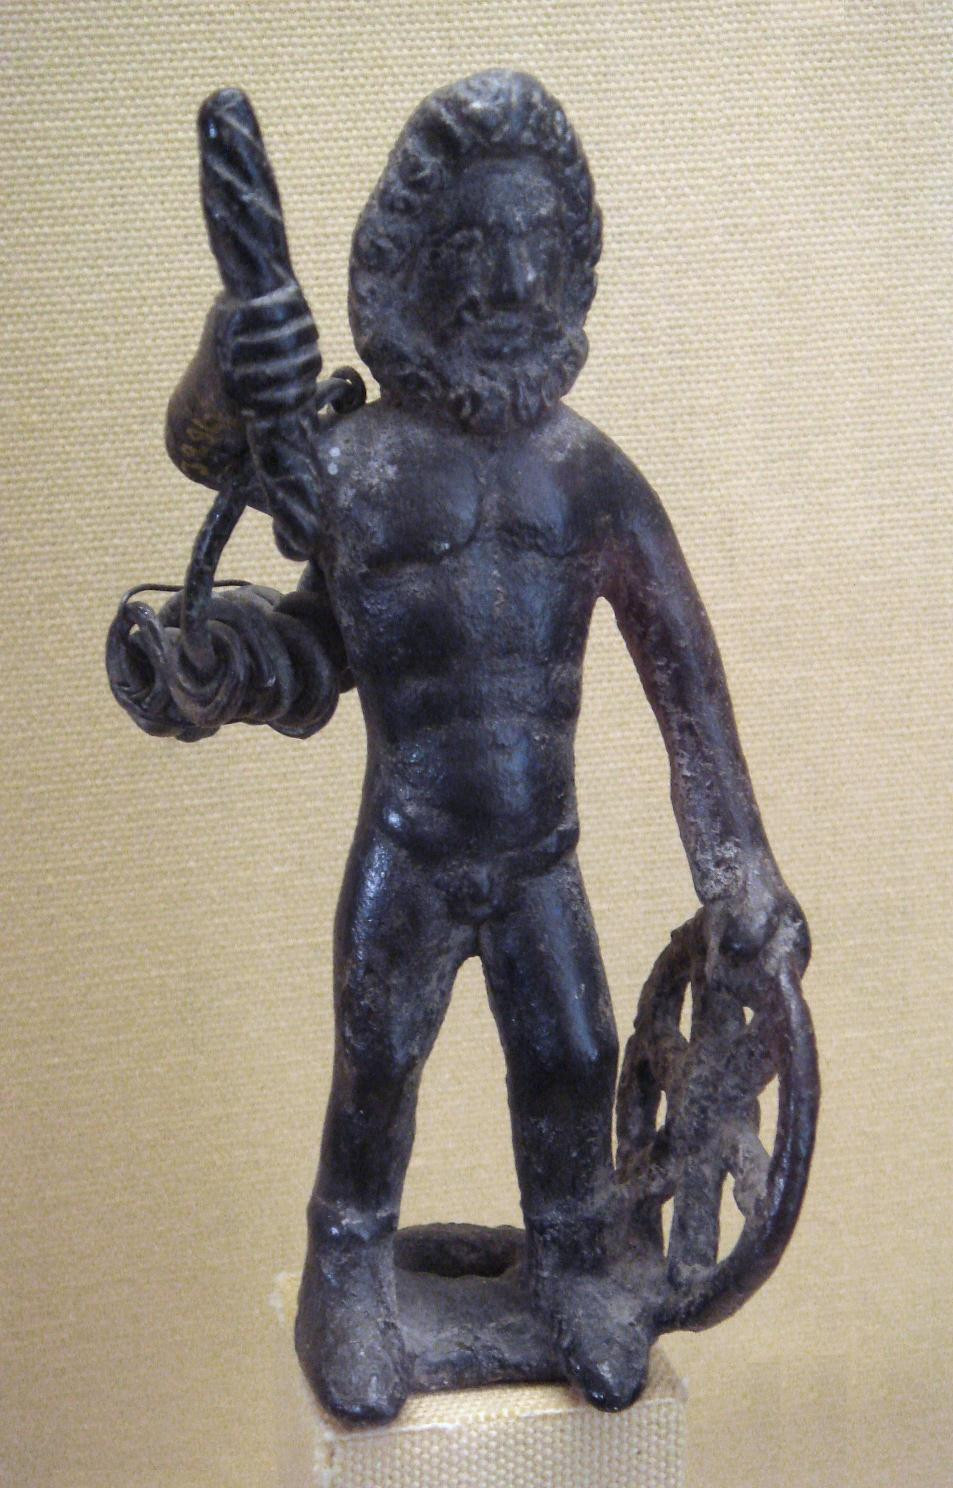 Bronzová socha Taranise z Le Châtelet de Gourzon, Haute-Marne. Zdroj viz Historyweb.sk